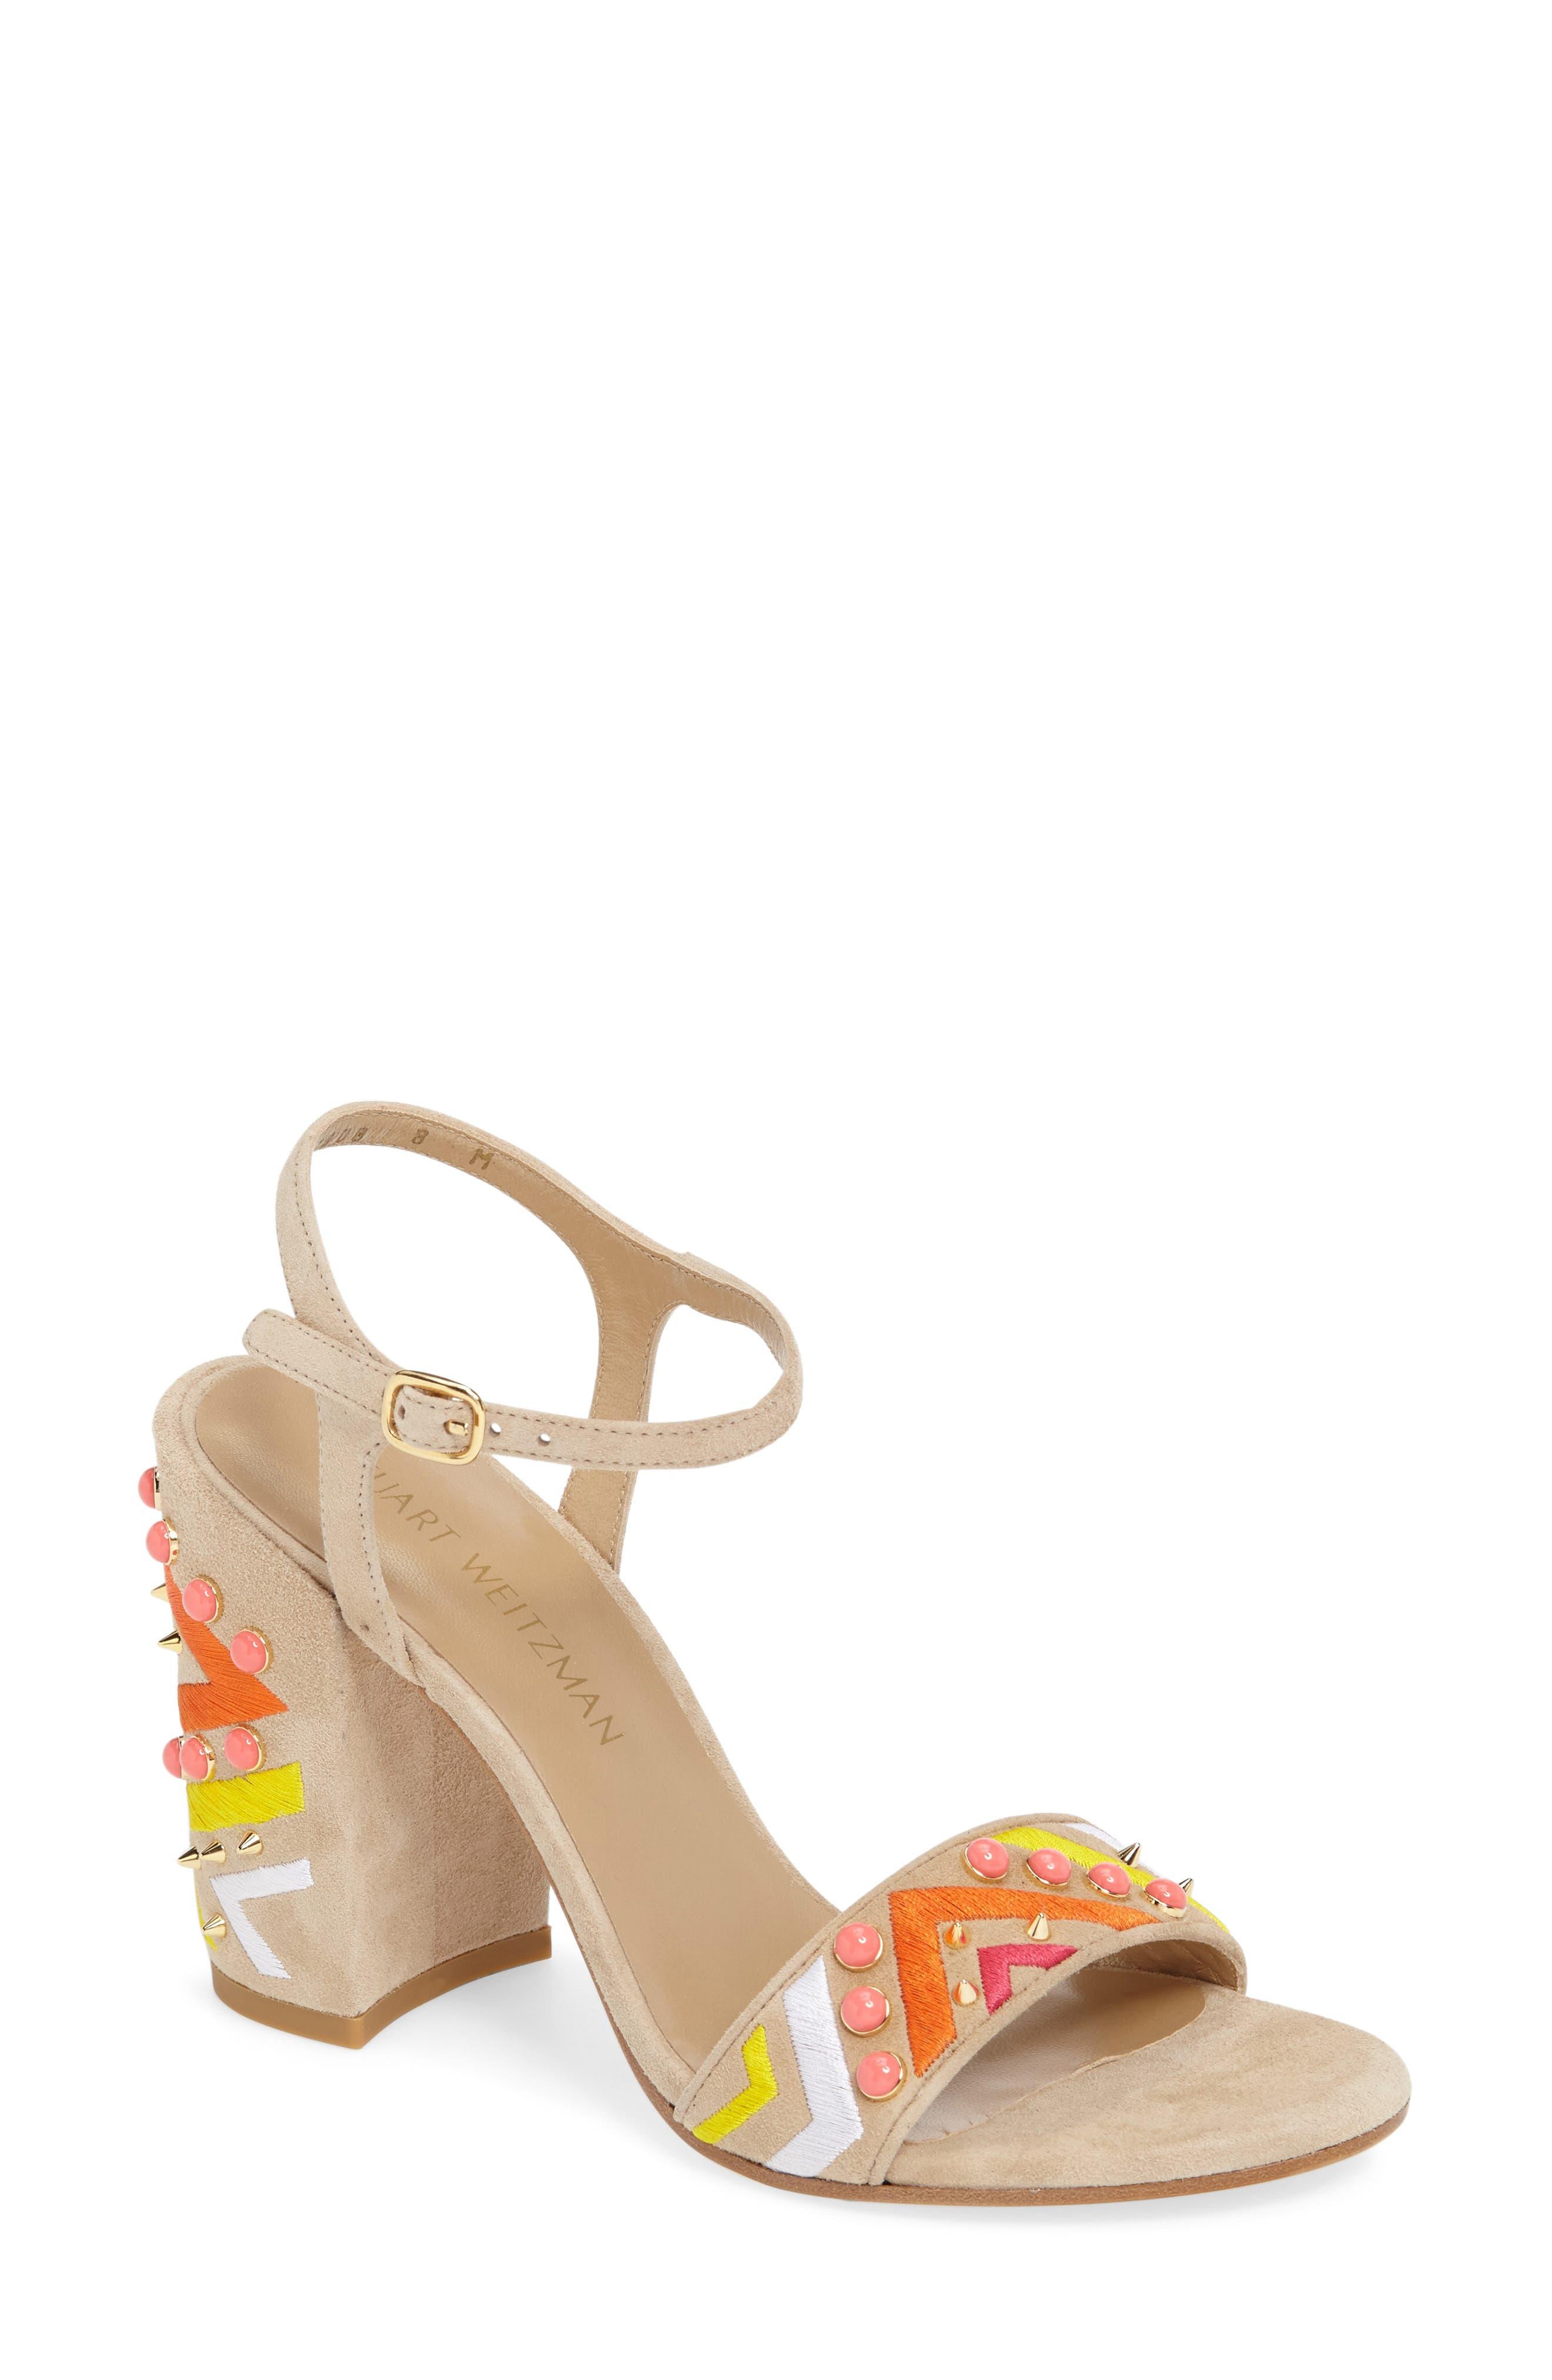 Alternate Image 1 Selected - Stuart Weitzman Both Embellished Sandal (Women)